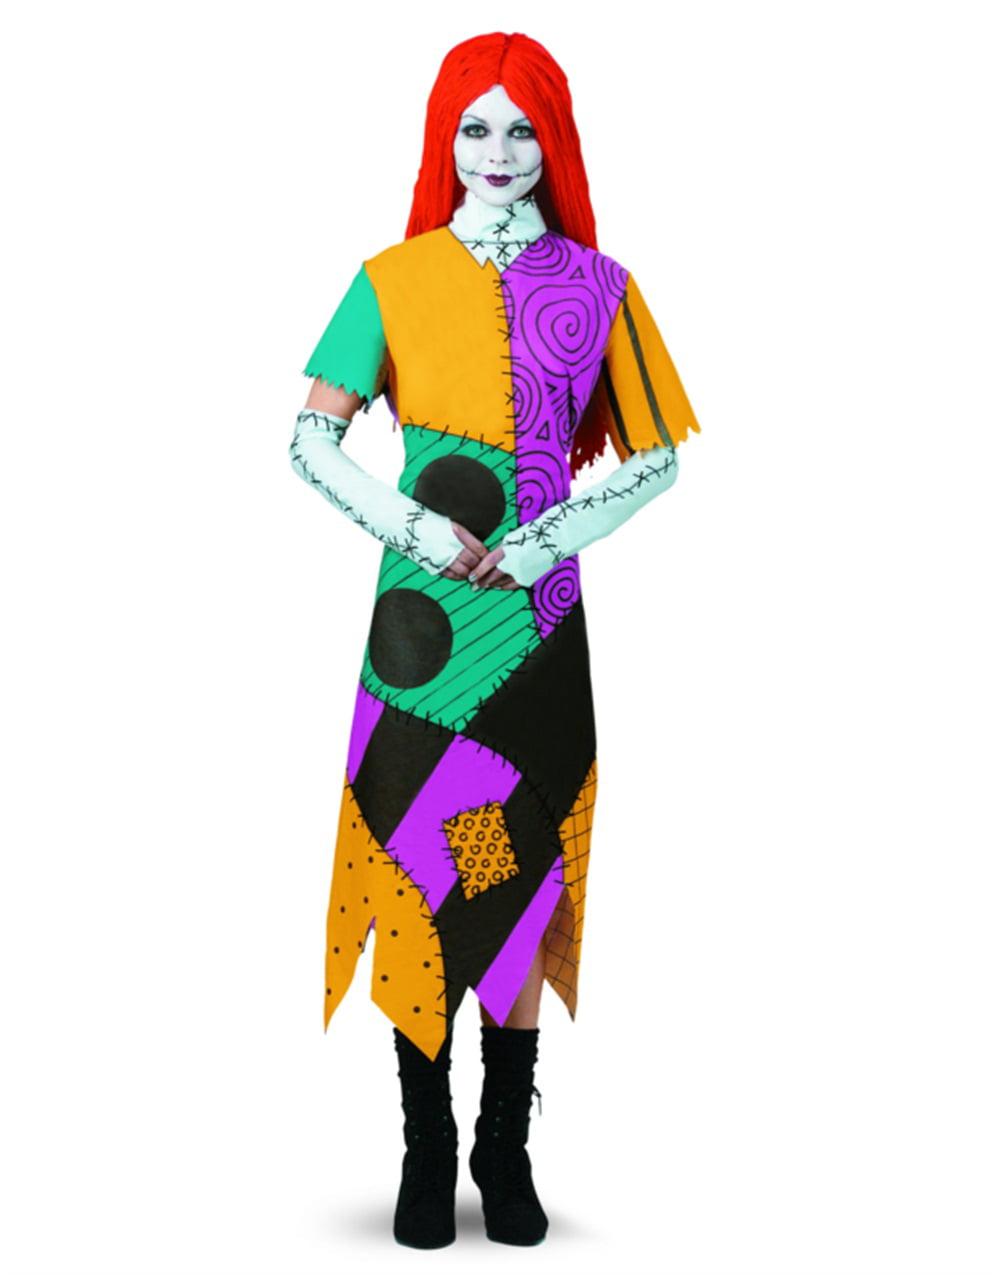 Adult Halloween Costumes - Walmart.com - Walmart.com